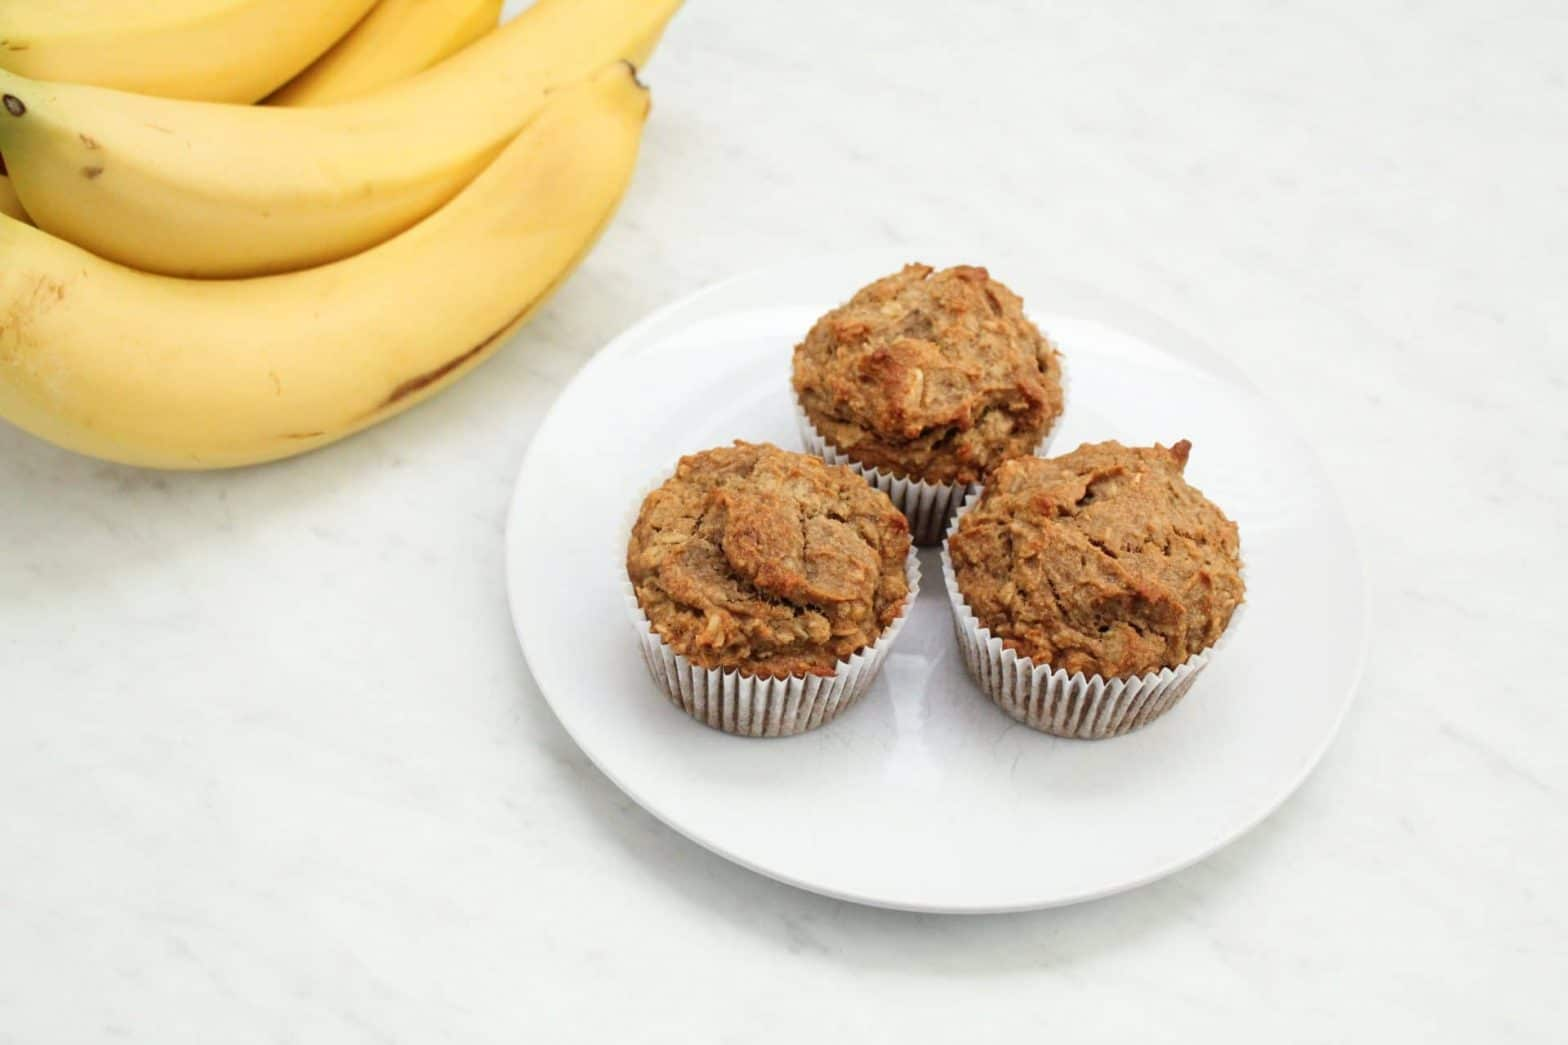 Gluten Free Banana Nut Oat Muffins Recipe